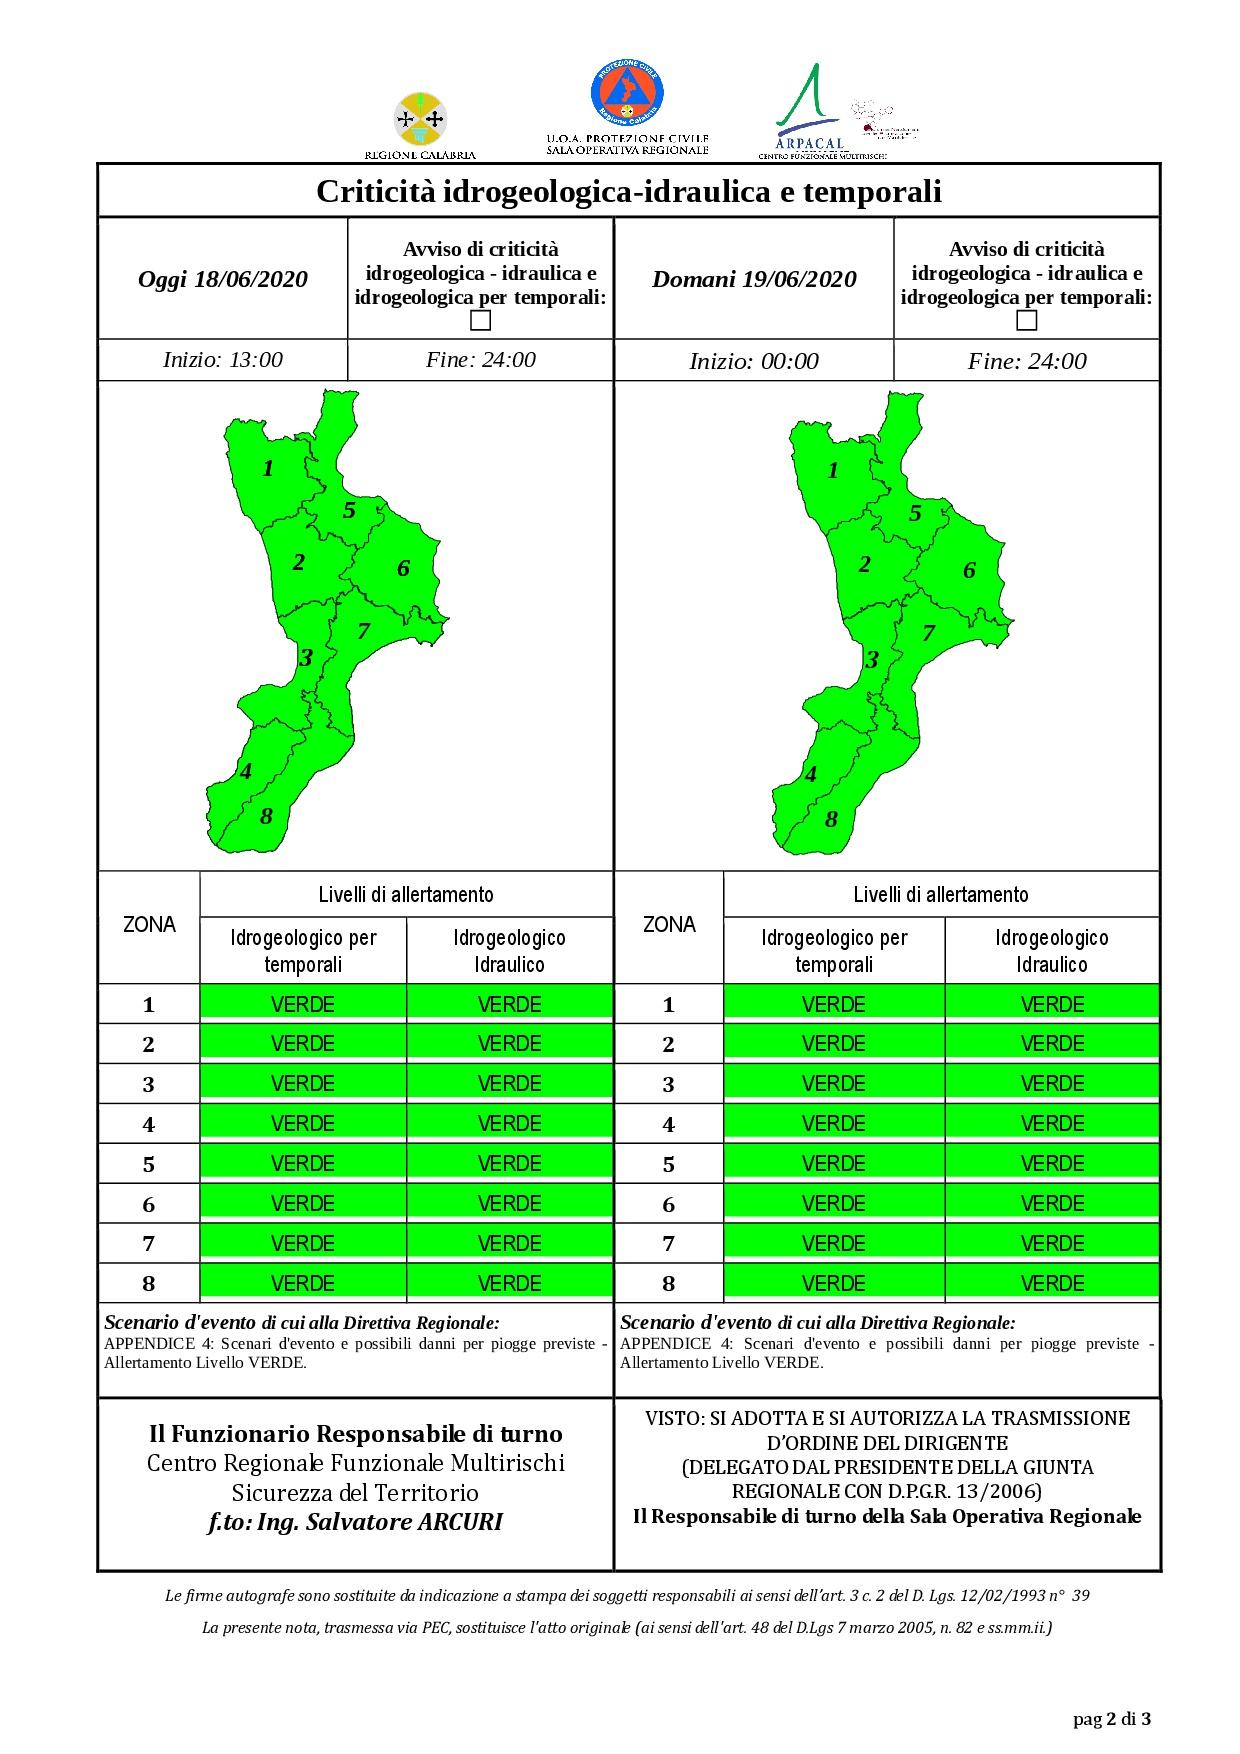 Criticità idrogeologica-idraulica e temporali in Calabria 18-06-2020